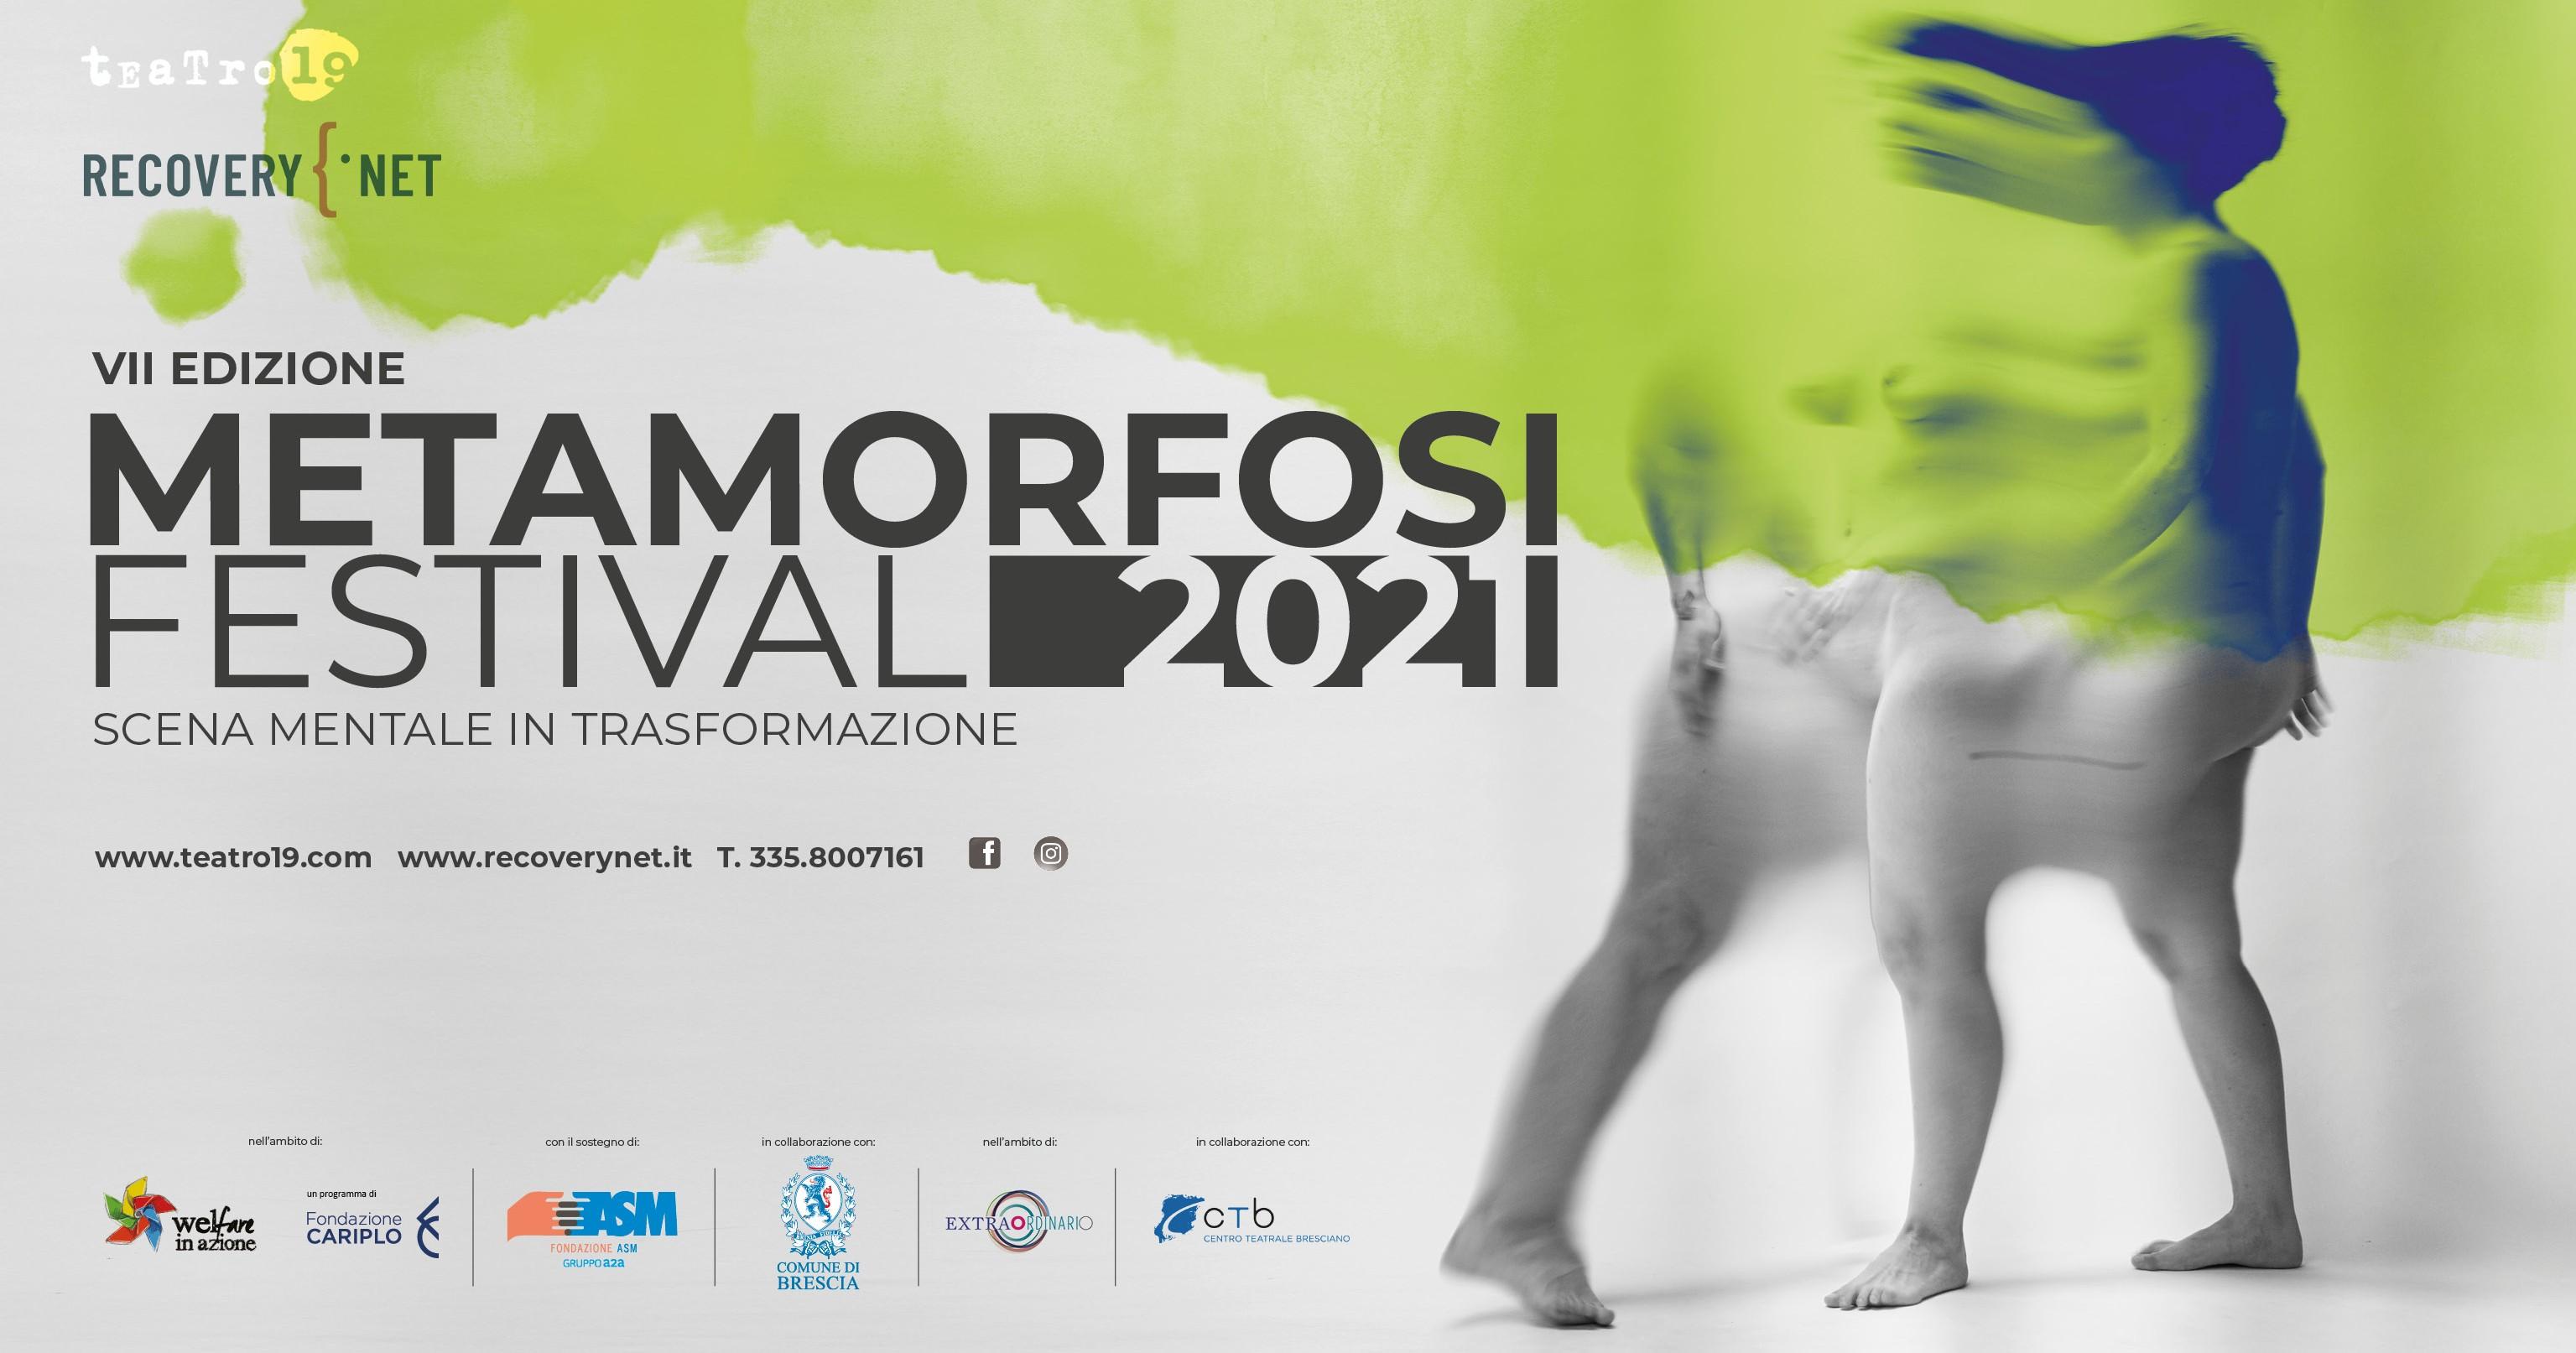 MetamorfosiFestival2021 in Recovery.net-Teatro19